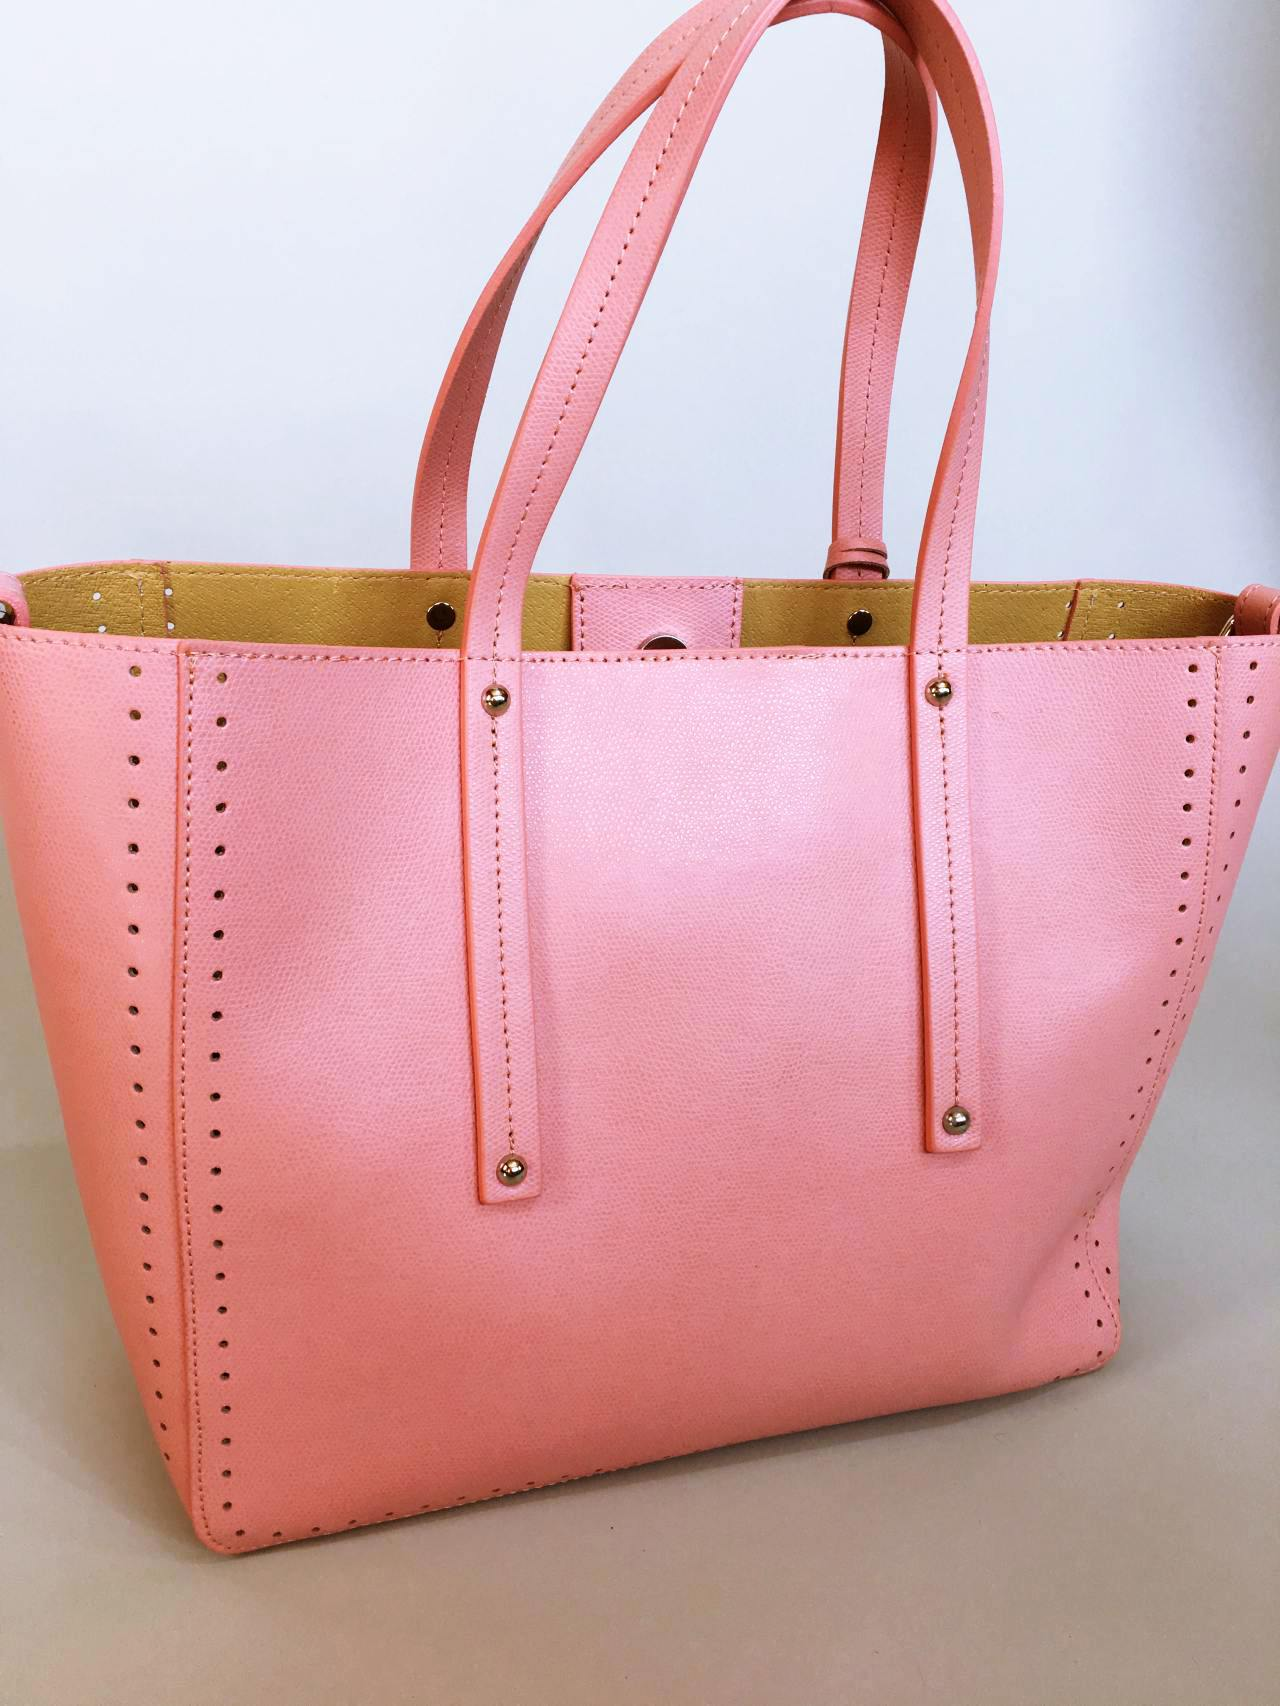 Kožená kabelka Bia růžová 03